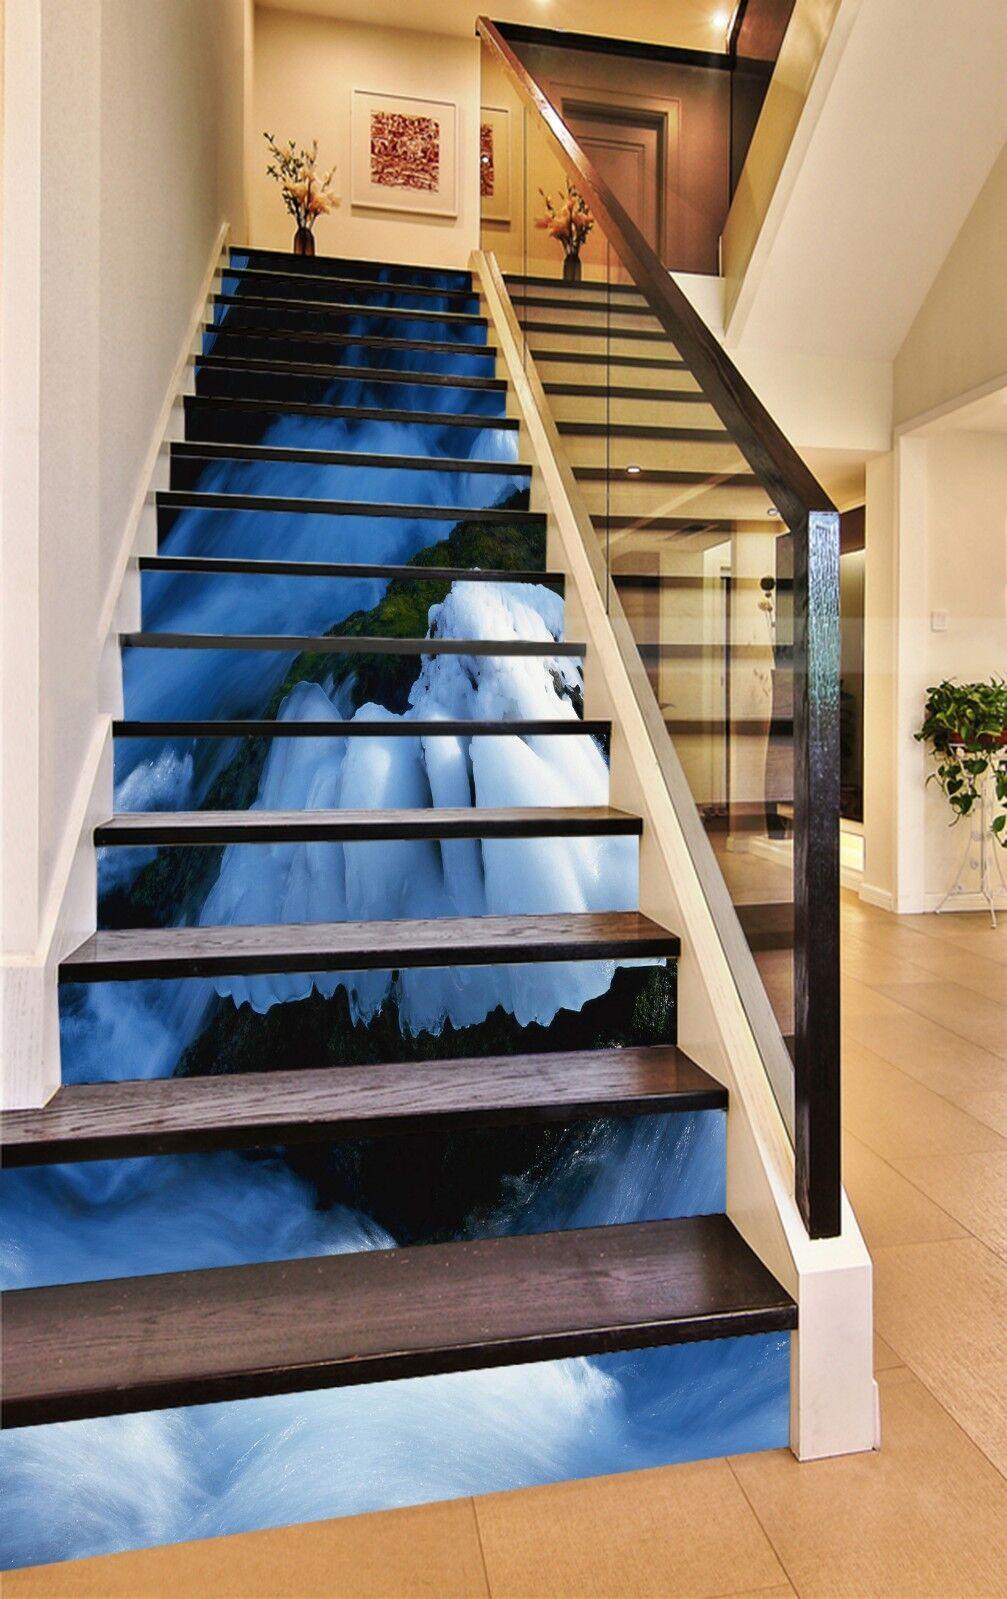 3D  Weiß Snow Stair Risers Decoration Photo Mural Vinyl Decal Wallpaper CA